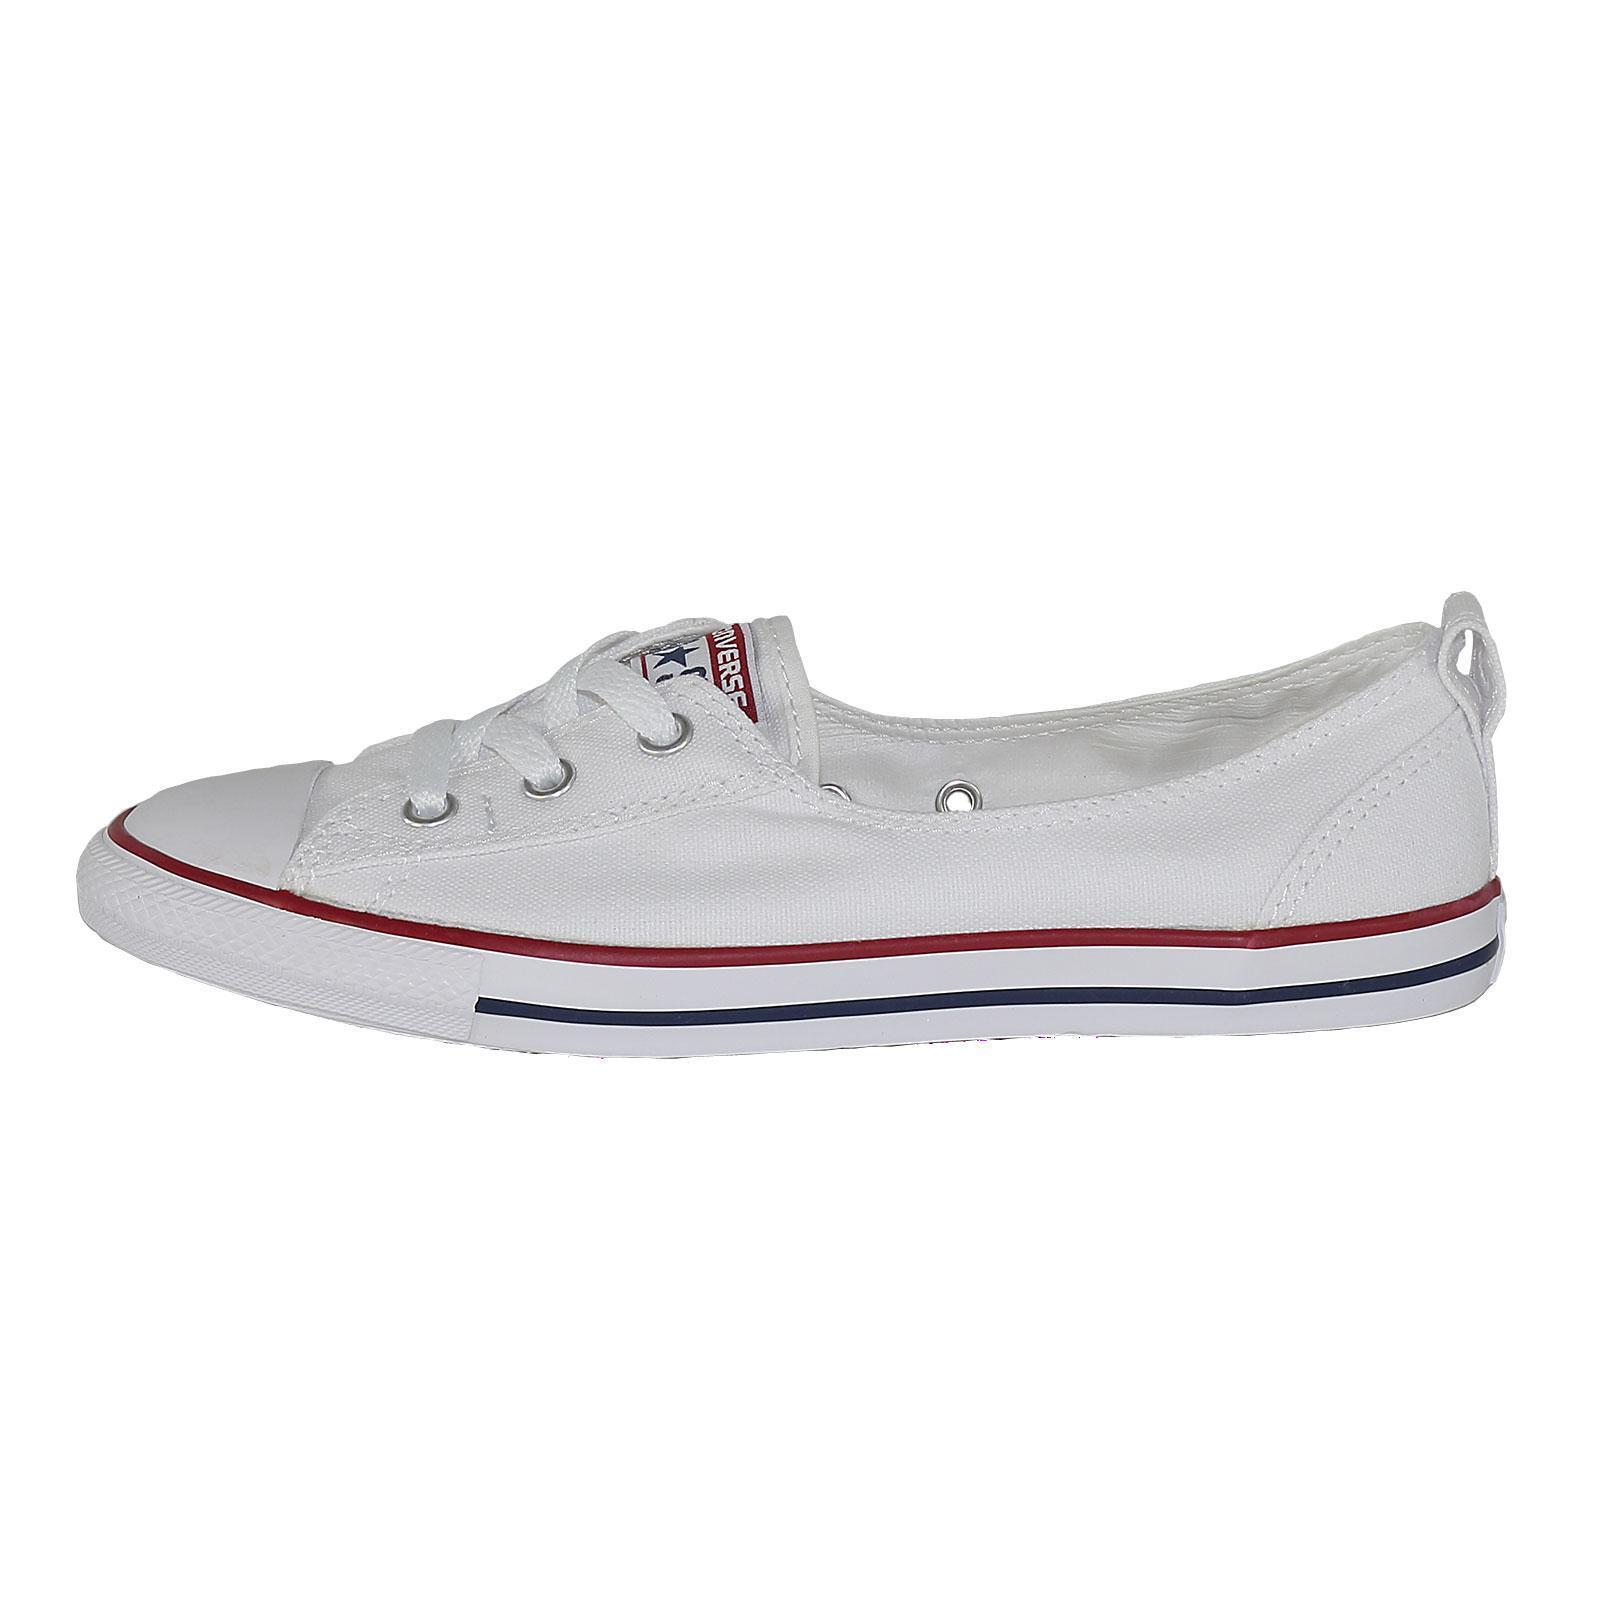 Converse CT Ballet Lace Slip Damenschuh Schuhe Slipper, Farbe weiß, 51050